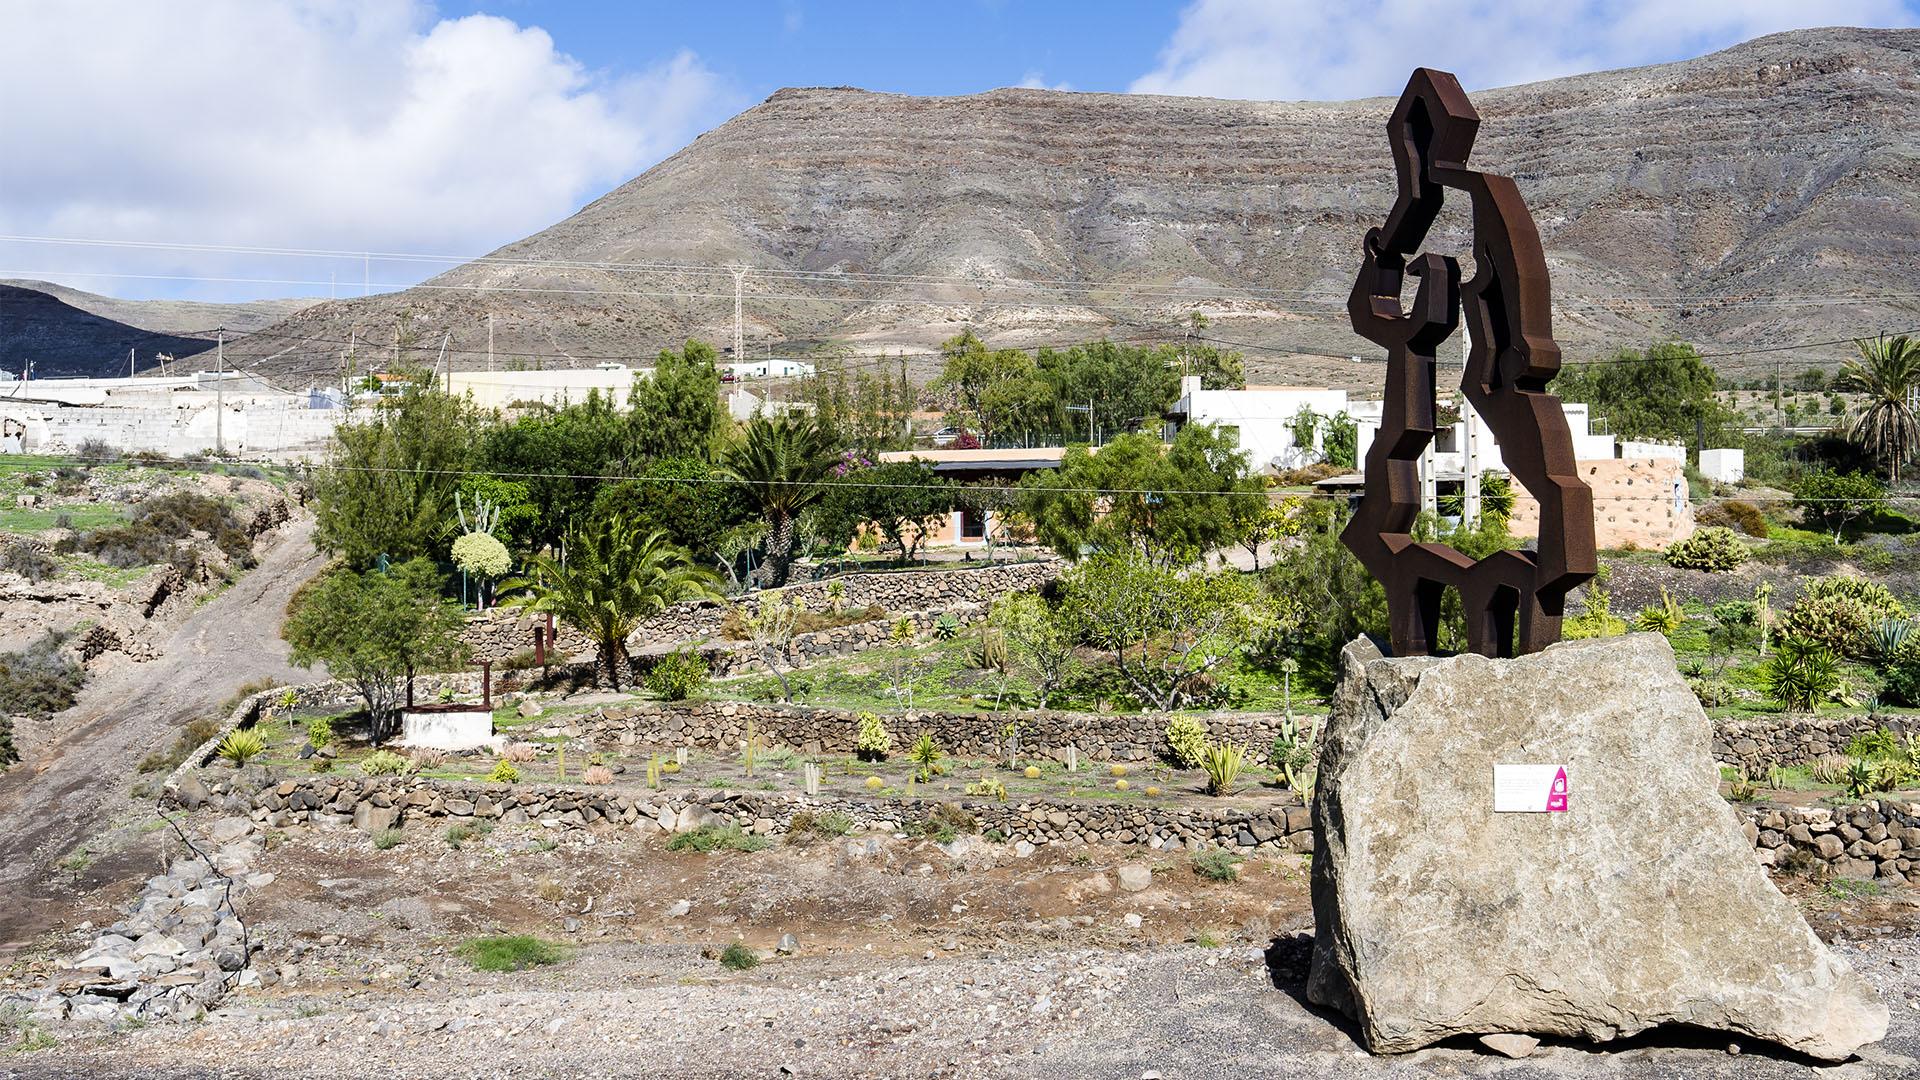 Cruces de Tesjuates bei Casillas del Ángel Fuerteventura.